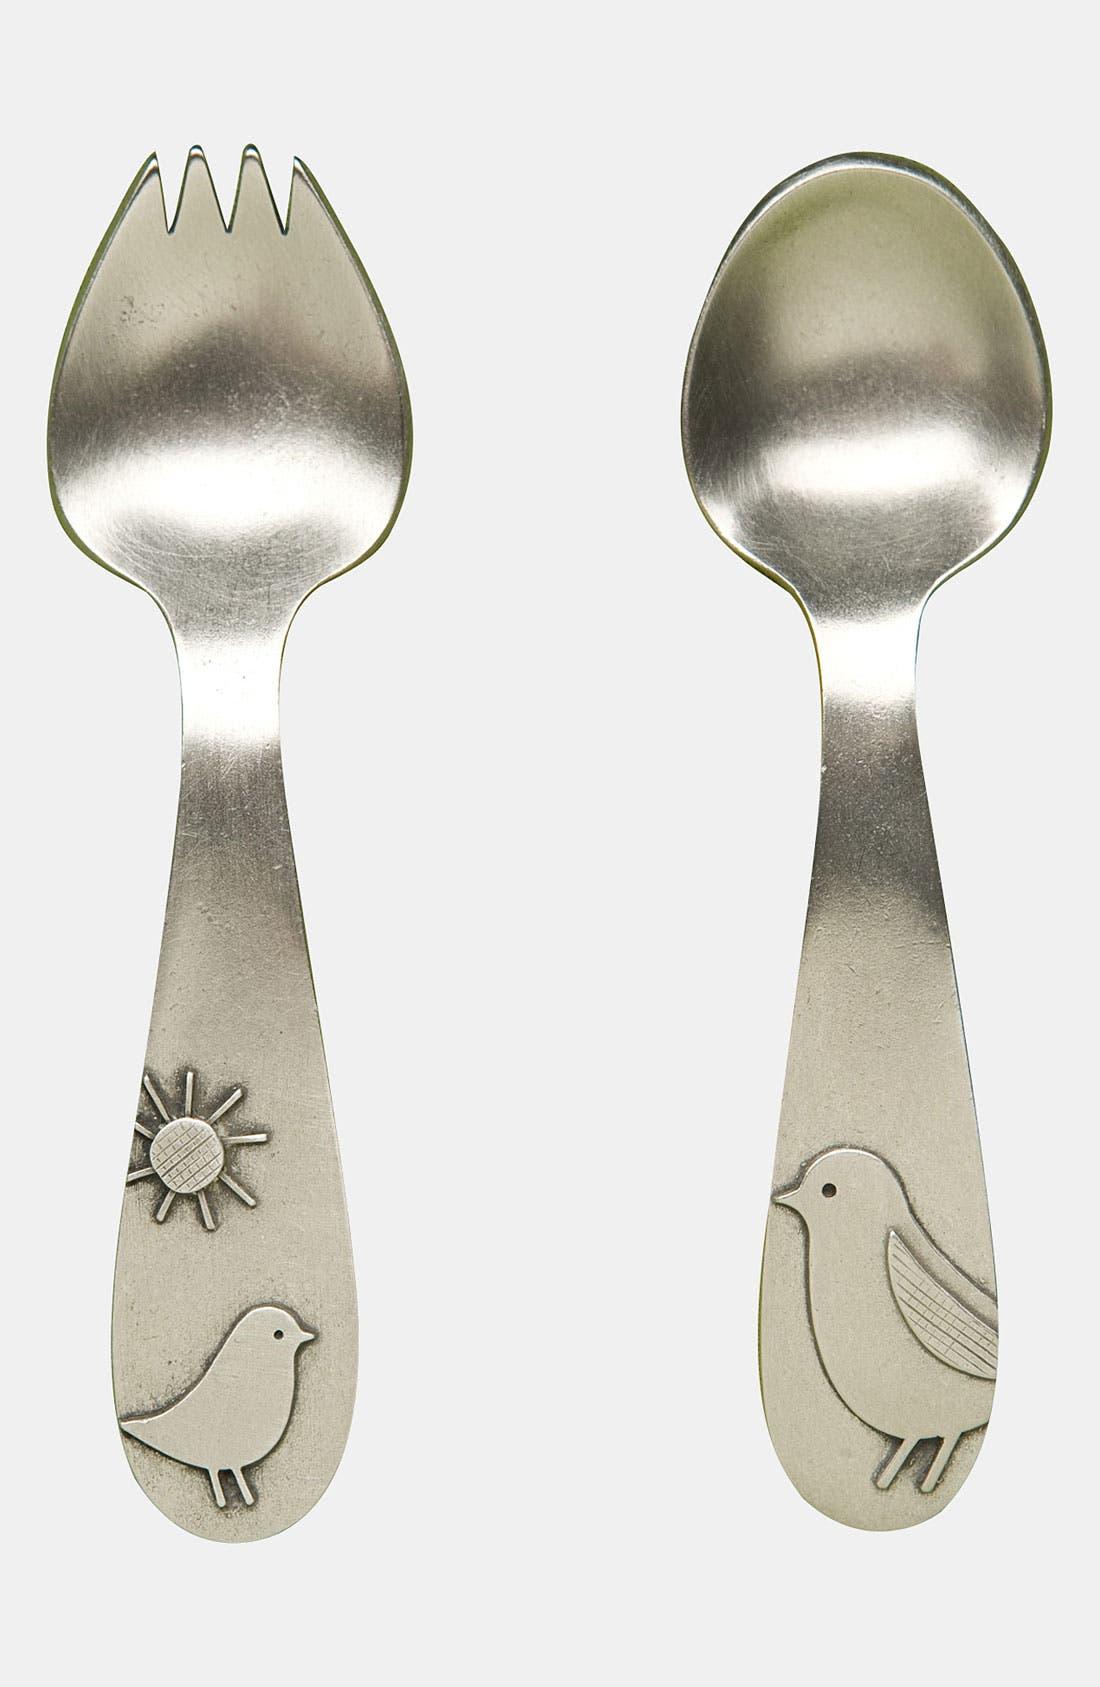 Main Image - Beehive Kitchenware 'Momma & Baby Bird' Keepsake Spoon & Fork